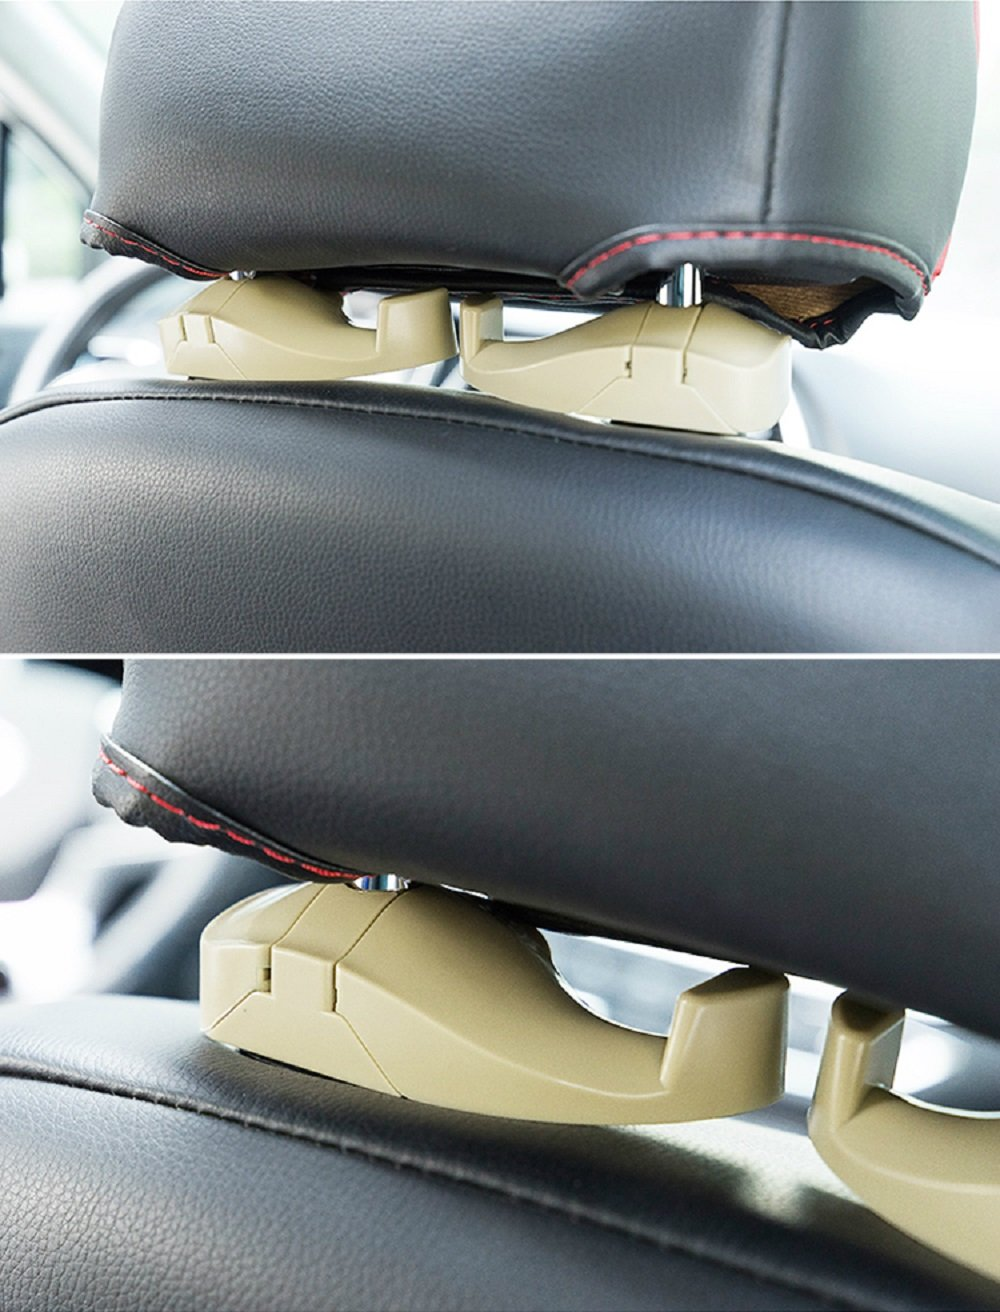 Universal Car Back Seat Headrest Hanger Holder Hook for Purse Groceries Bag Handbag,2 Pack Car Back Seat Hook for Headrest Organizer Hanger Storage MUKUN Car Headrest Hooks